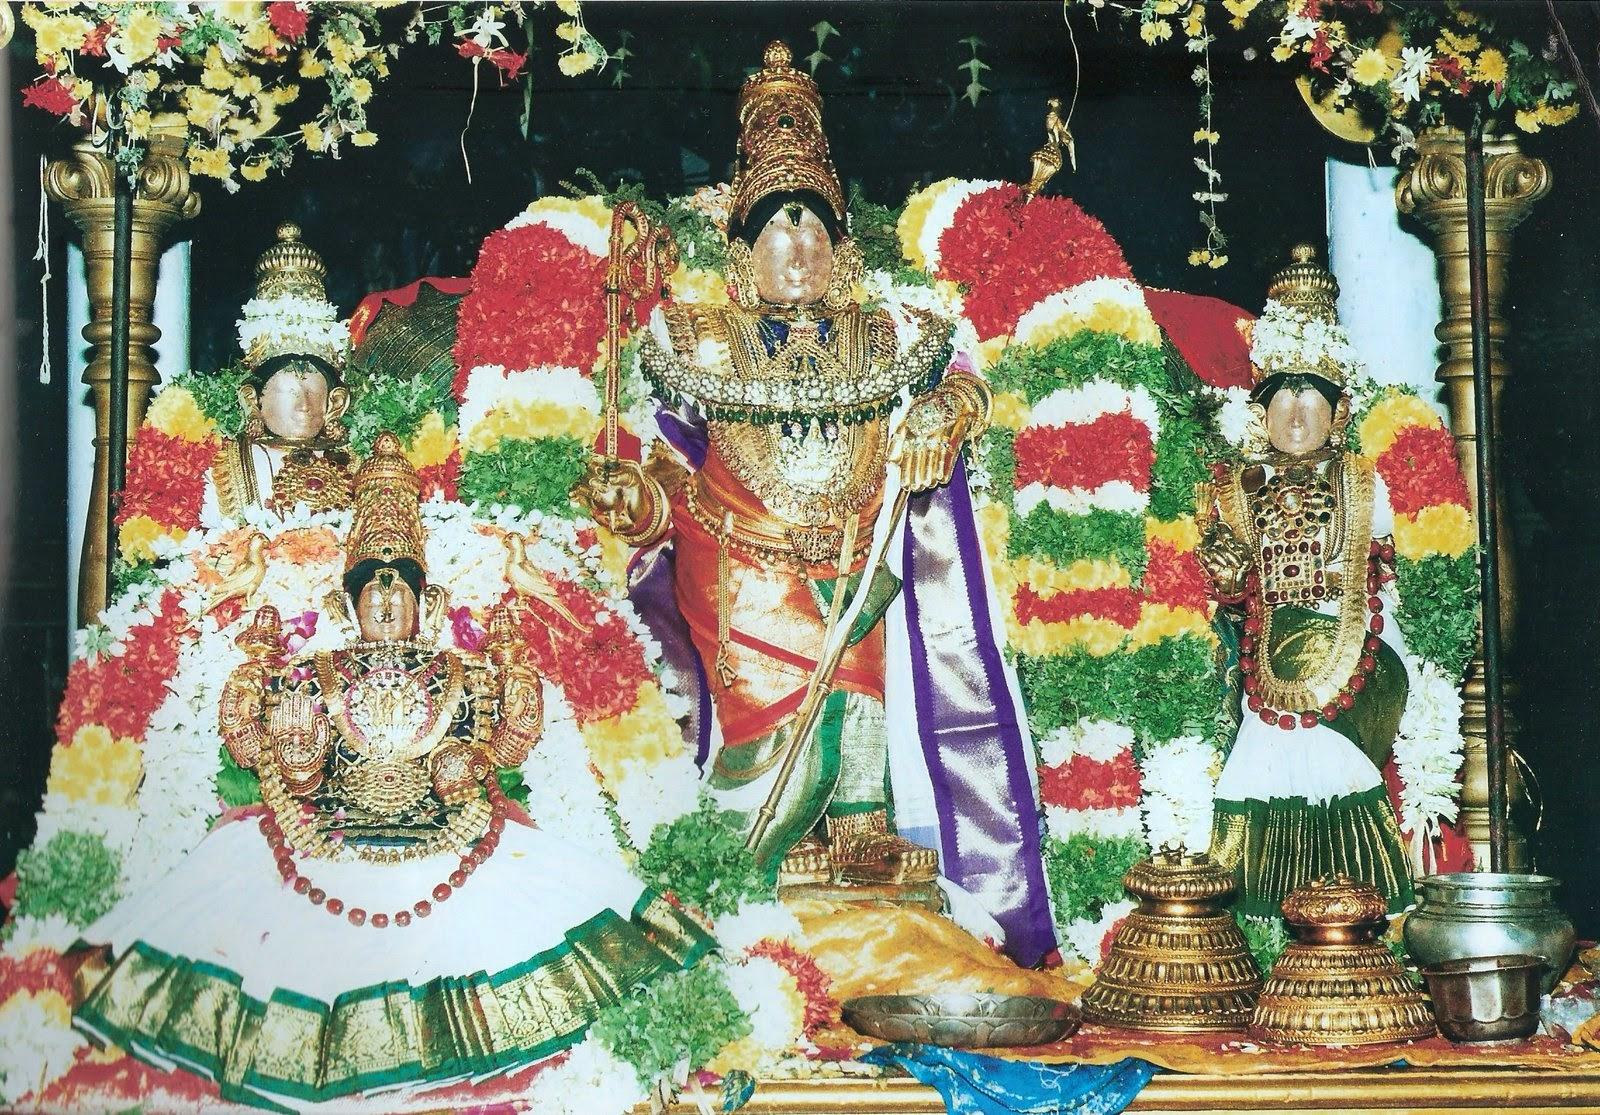 Raja Gopalaswamy statue Raja Gopal Temple, Mannargudi